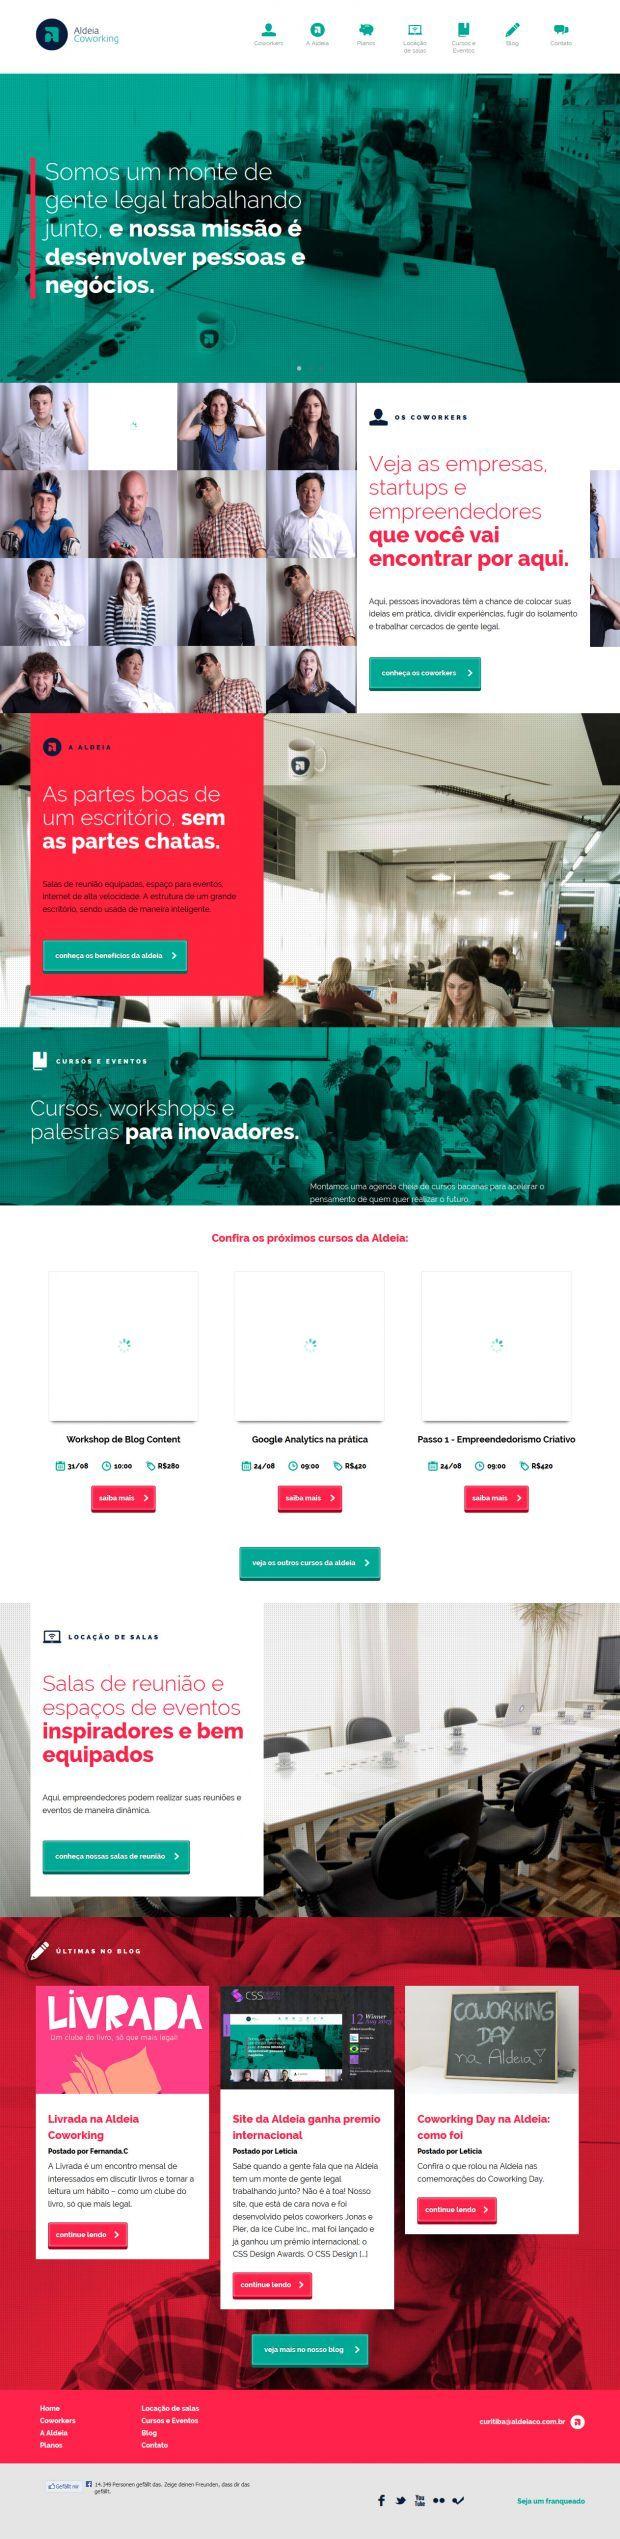 Aldeia Coworking - Webdesign inspiration www.niceoneilike.com